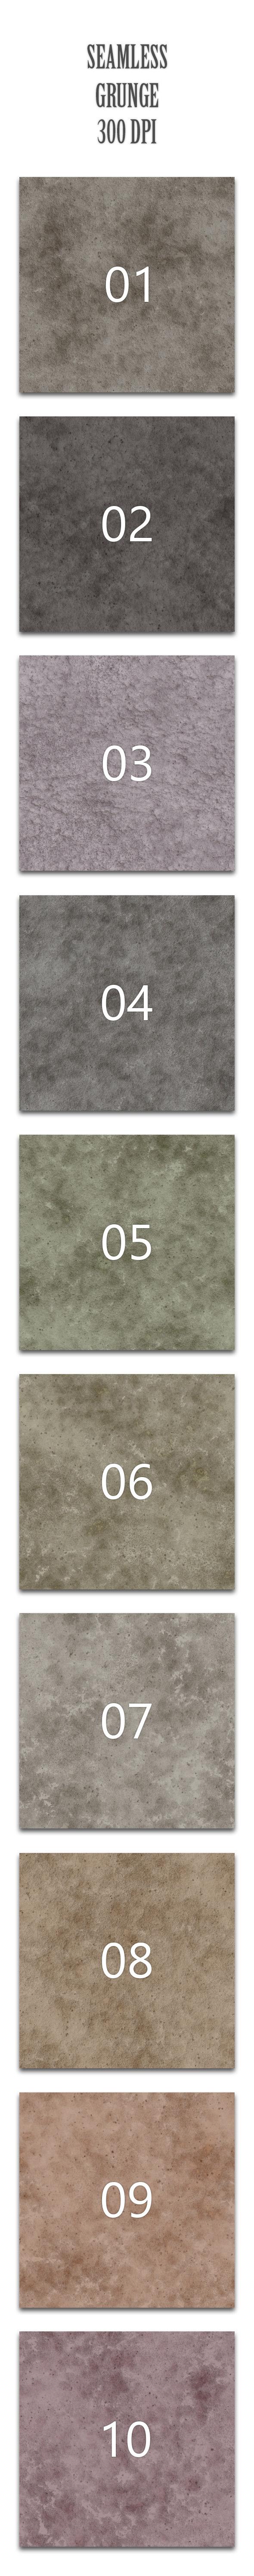 Seamless Grunge - Textures / Fills / Patterns Photoshop